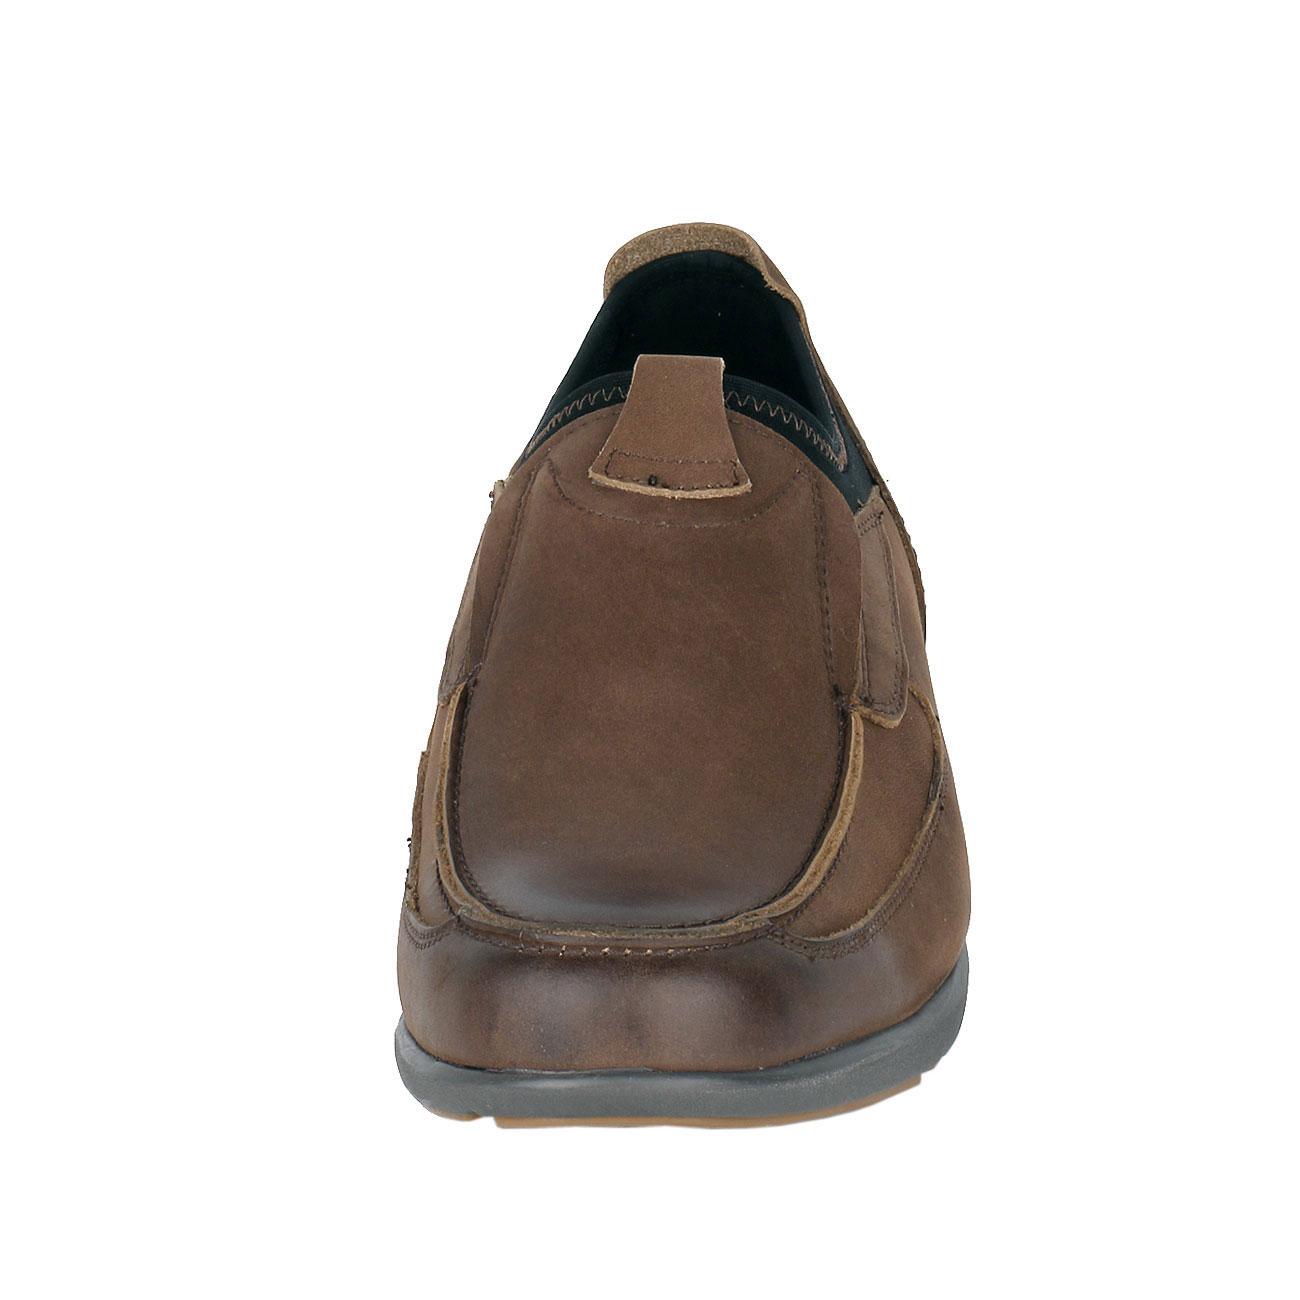 Fashion Slip on Shoe Comfort & Versatility Height Elevation 2